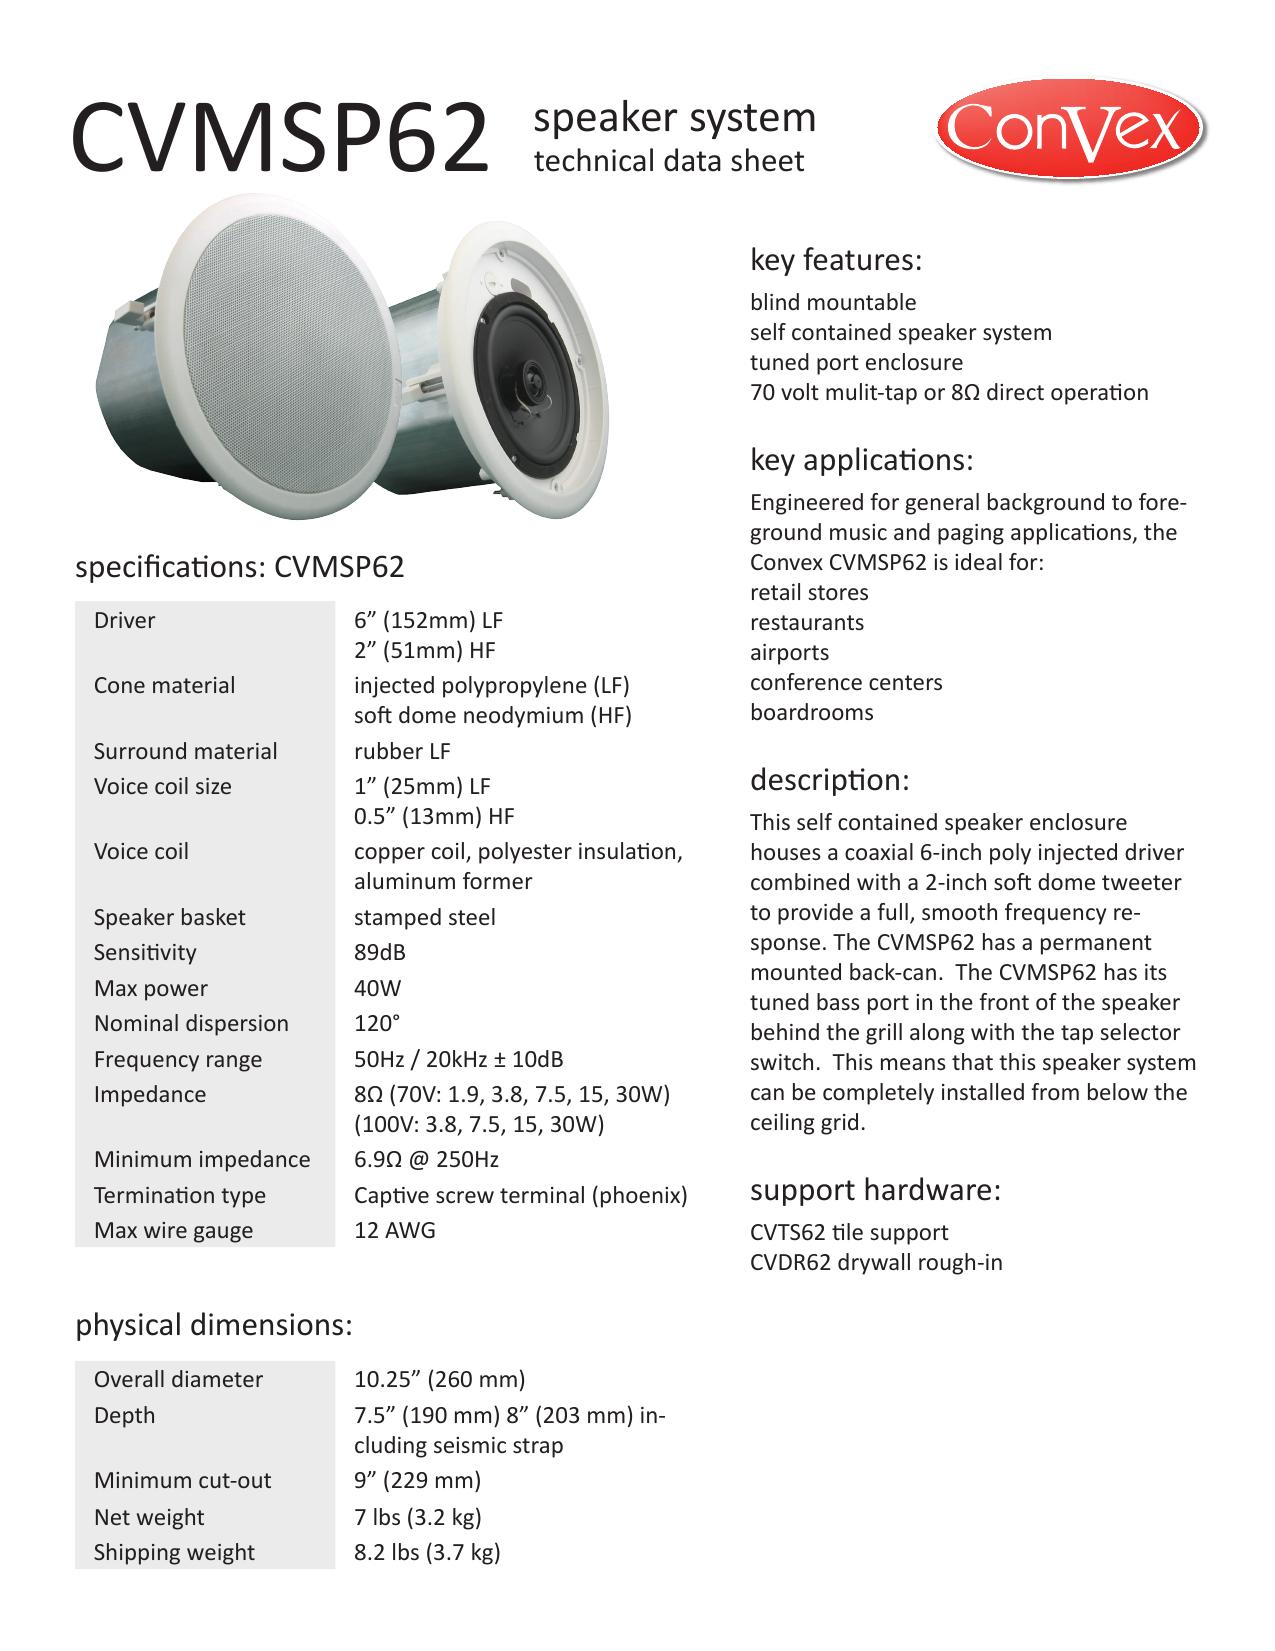 CVMSP62 speaker system - Martech | manualzz com